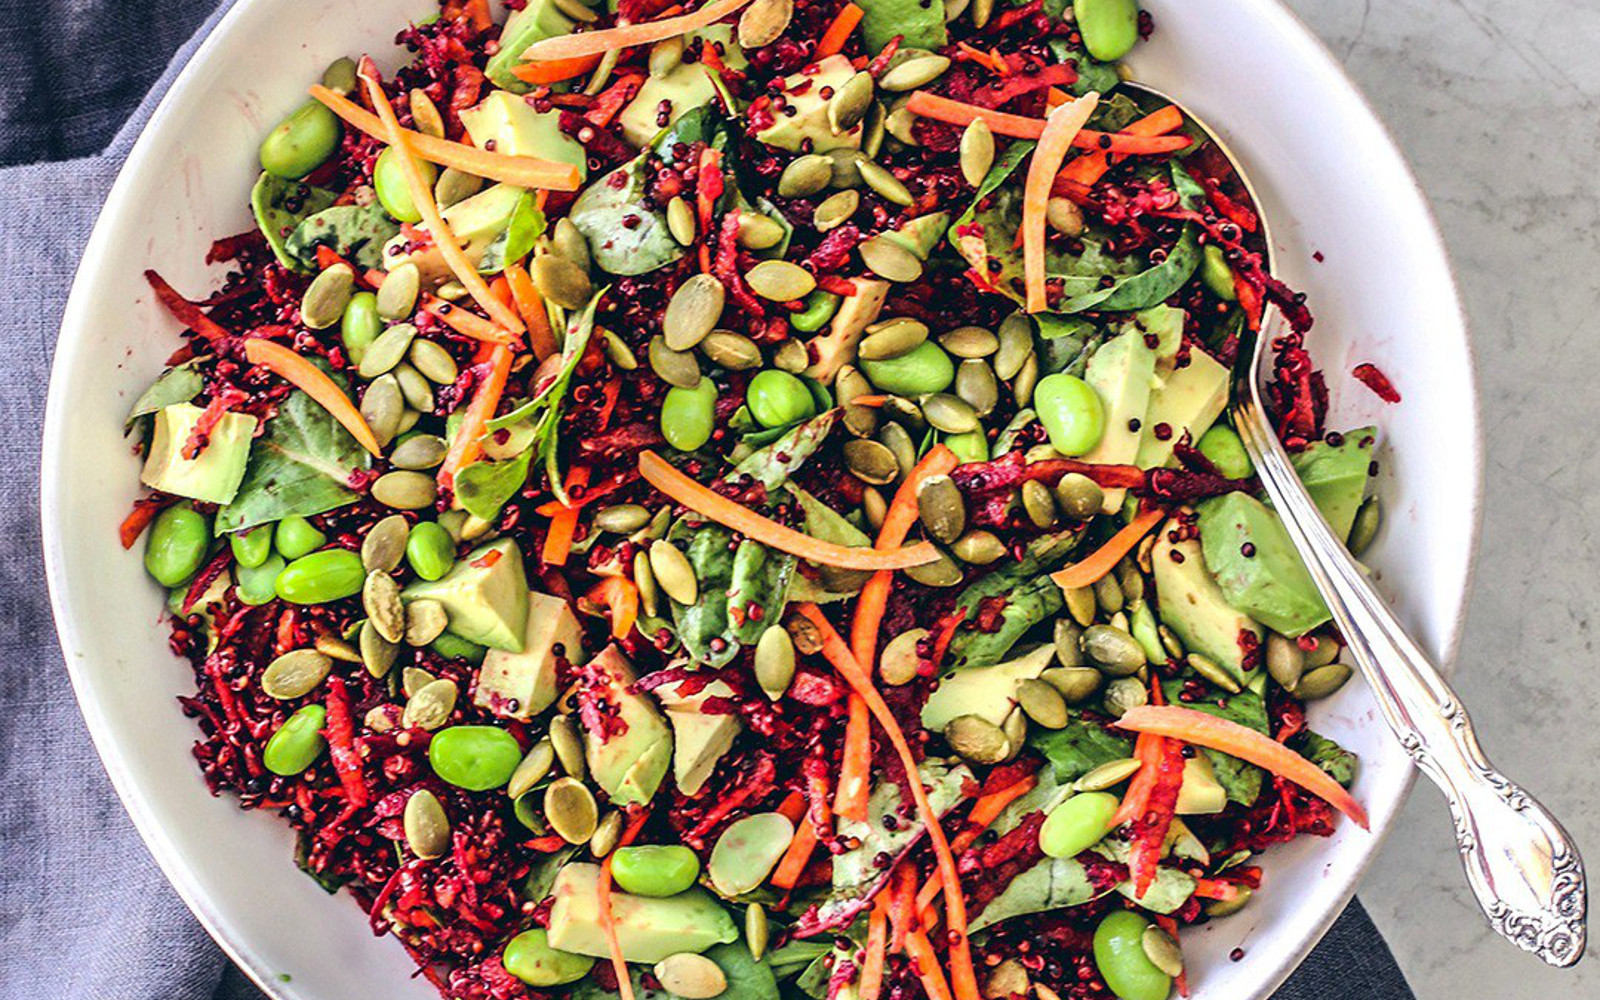 Bright Beet Salad With Quinoa In a Citrus Vinaigrette